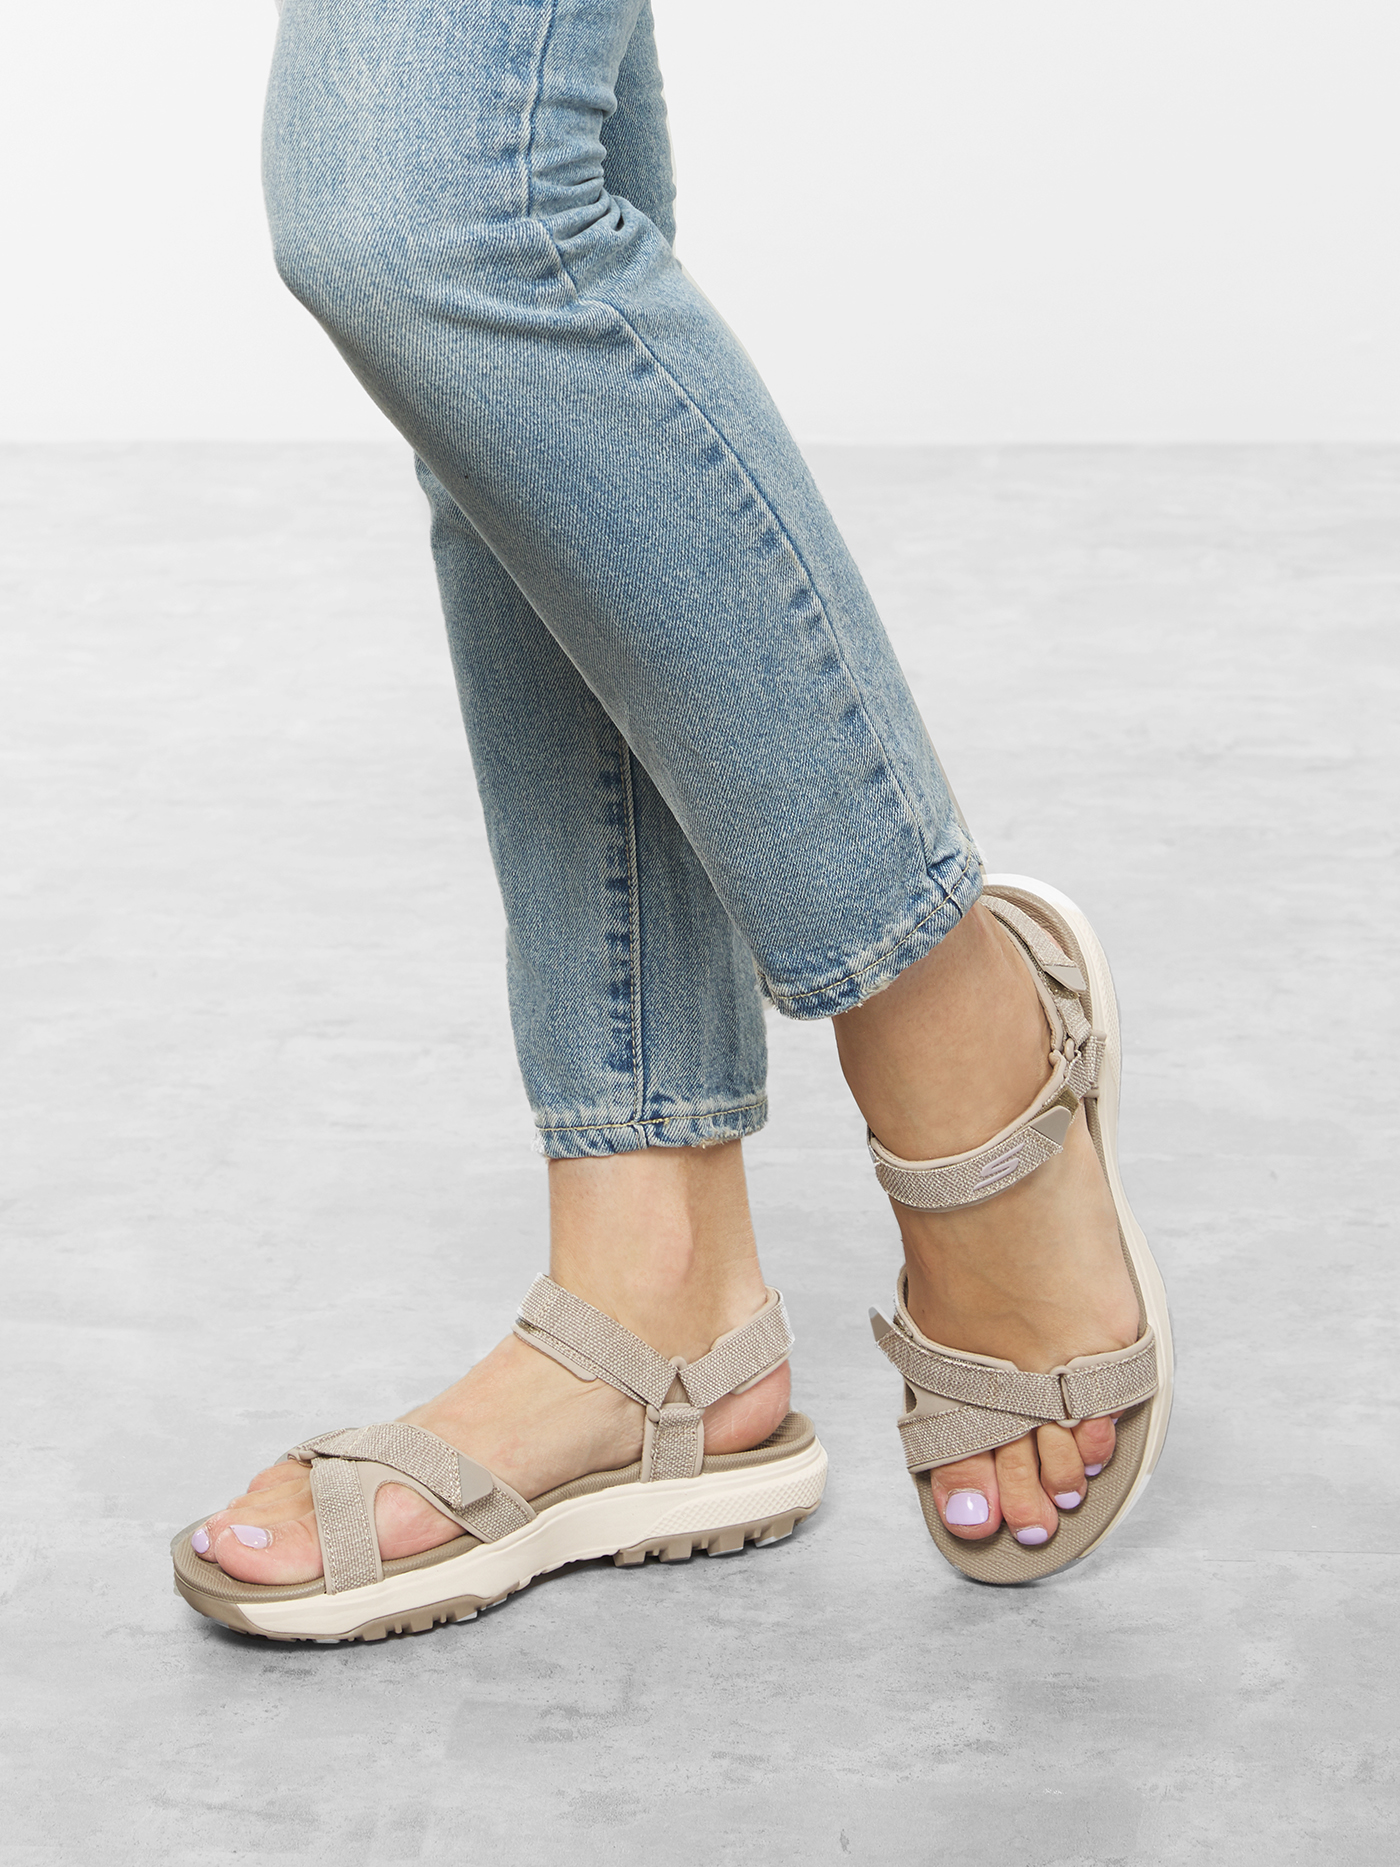 Сандалі  для жінок Skechers 16213 TPE брендове взуття, 2017